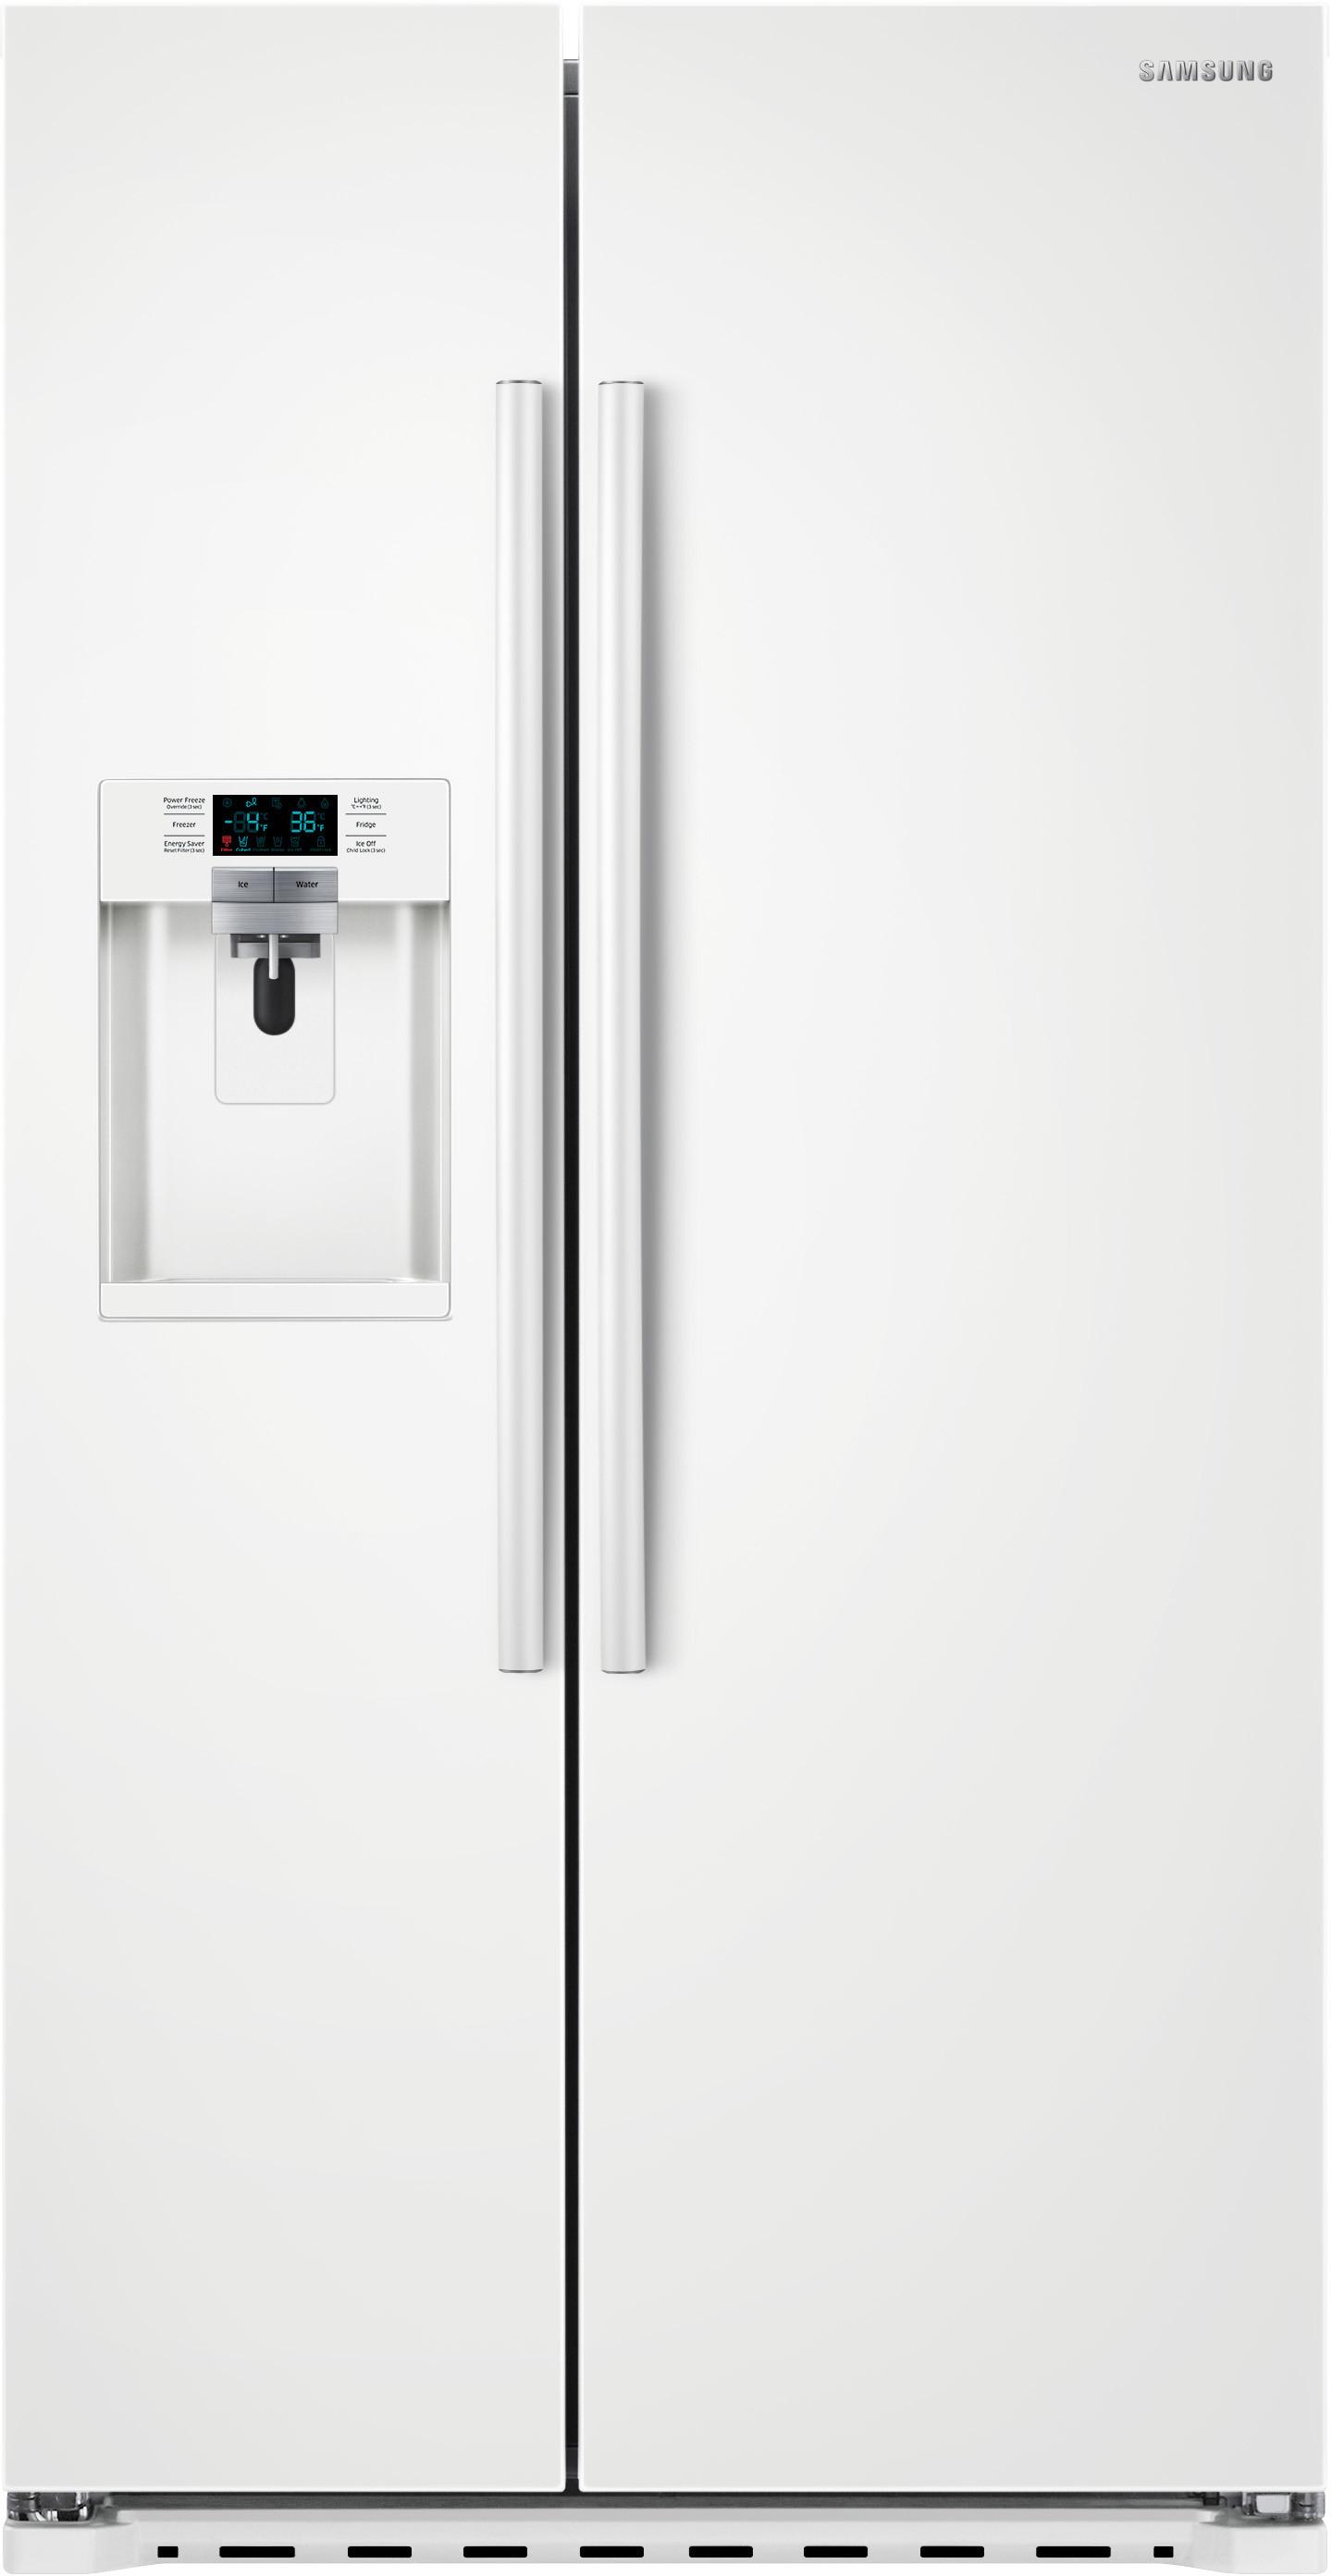 Samsung Side By Side Refrigerators